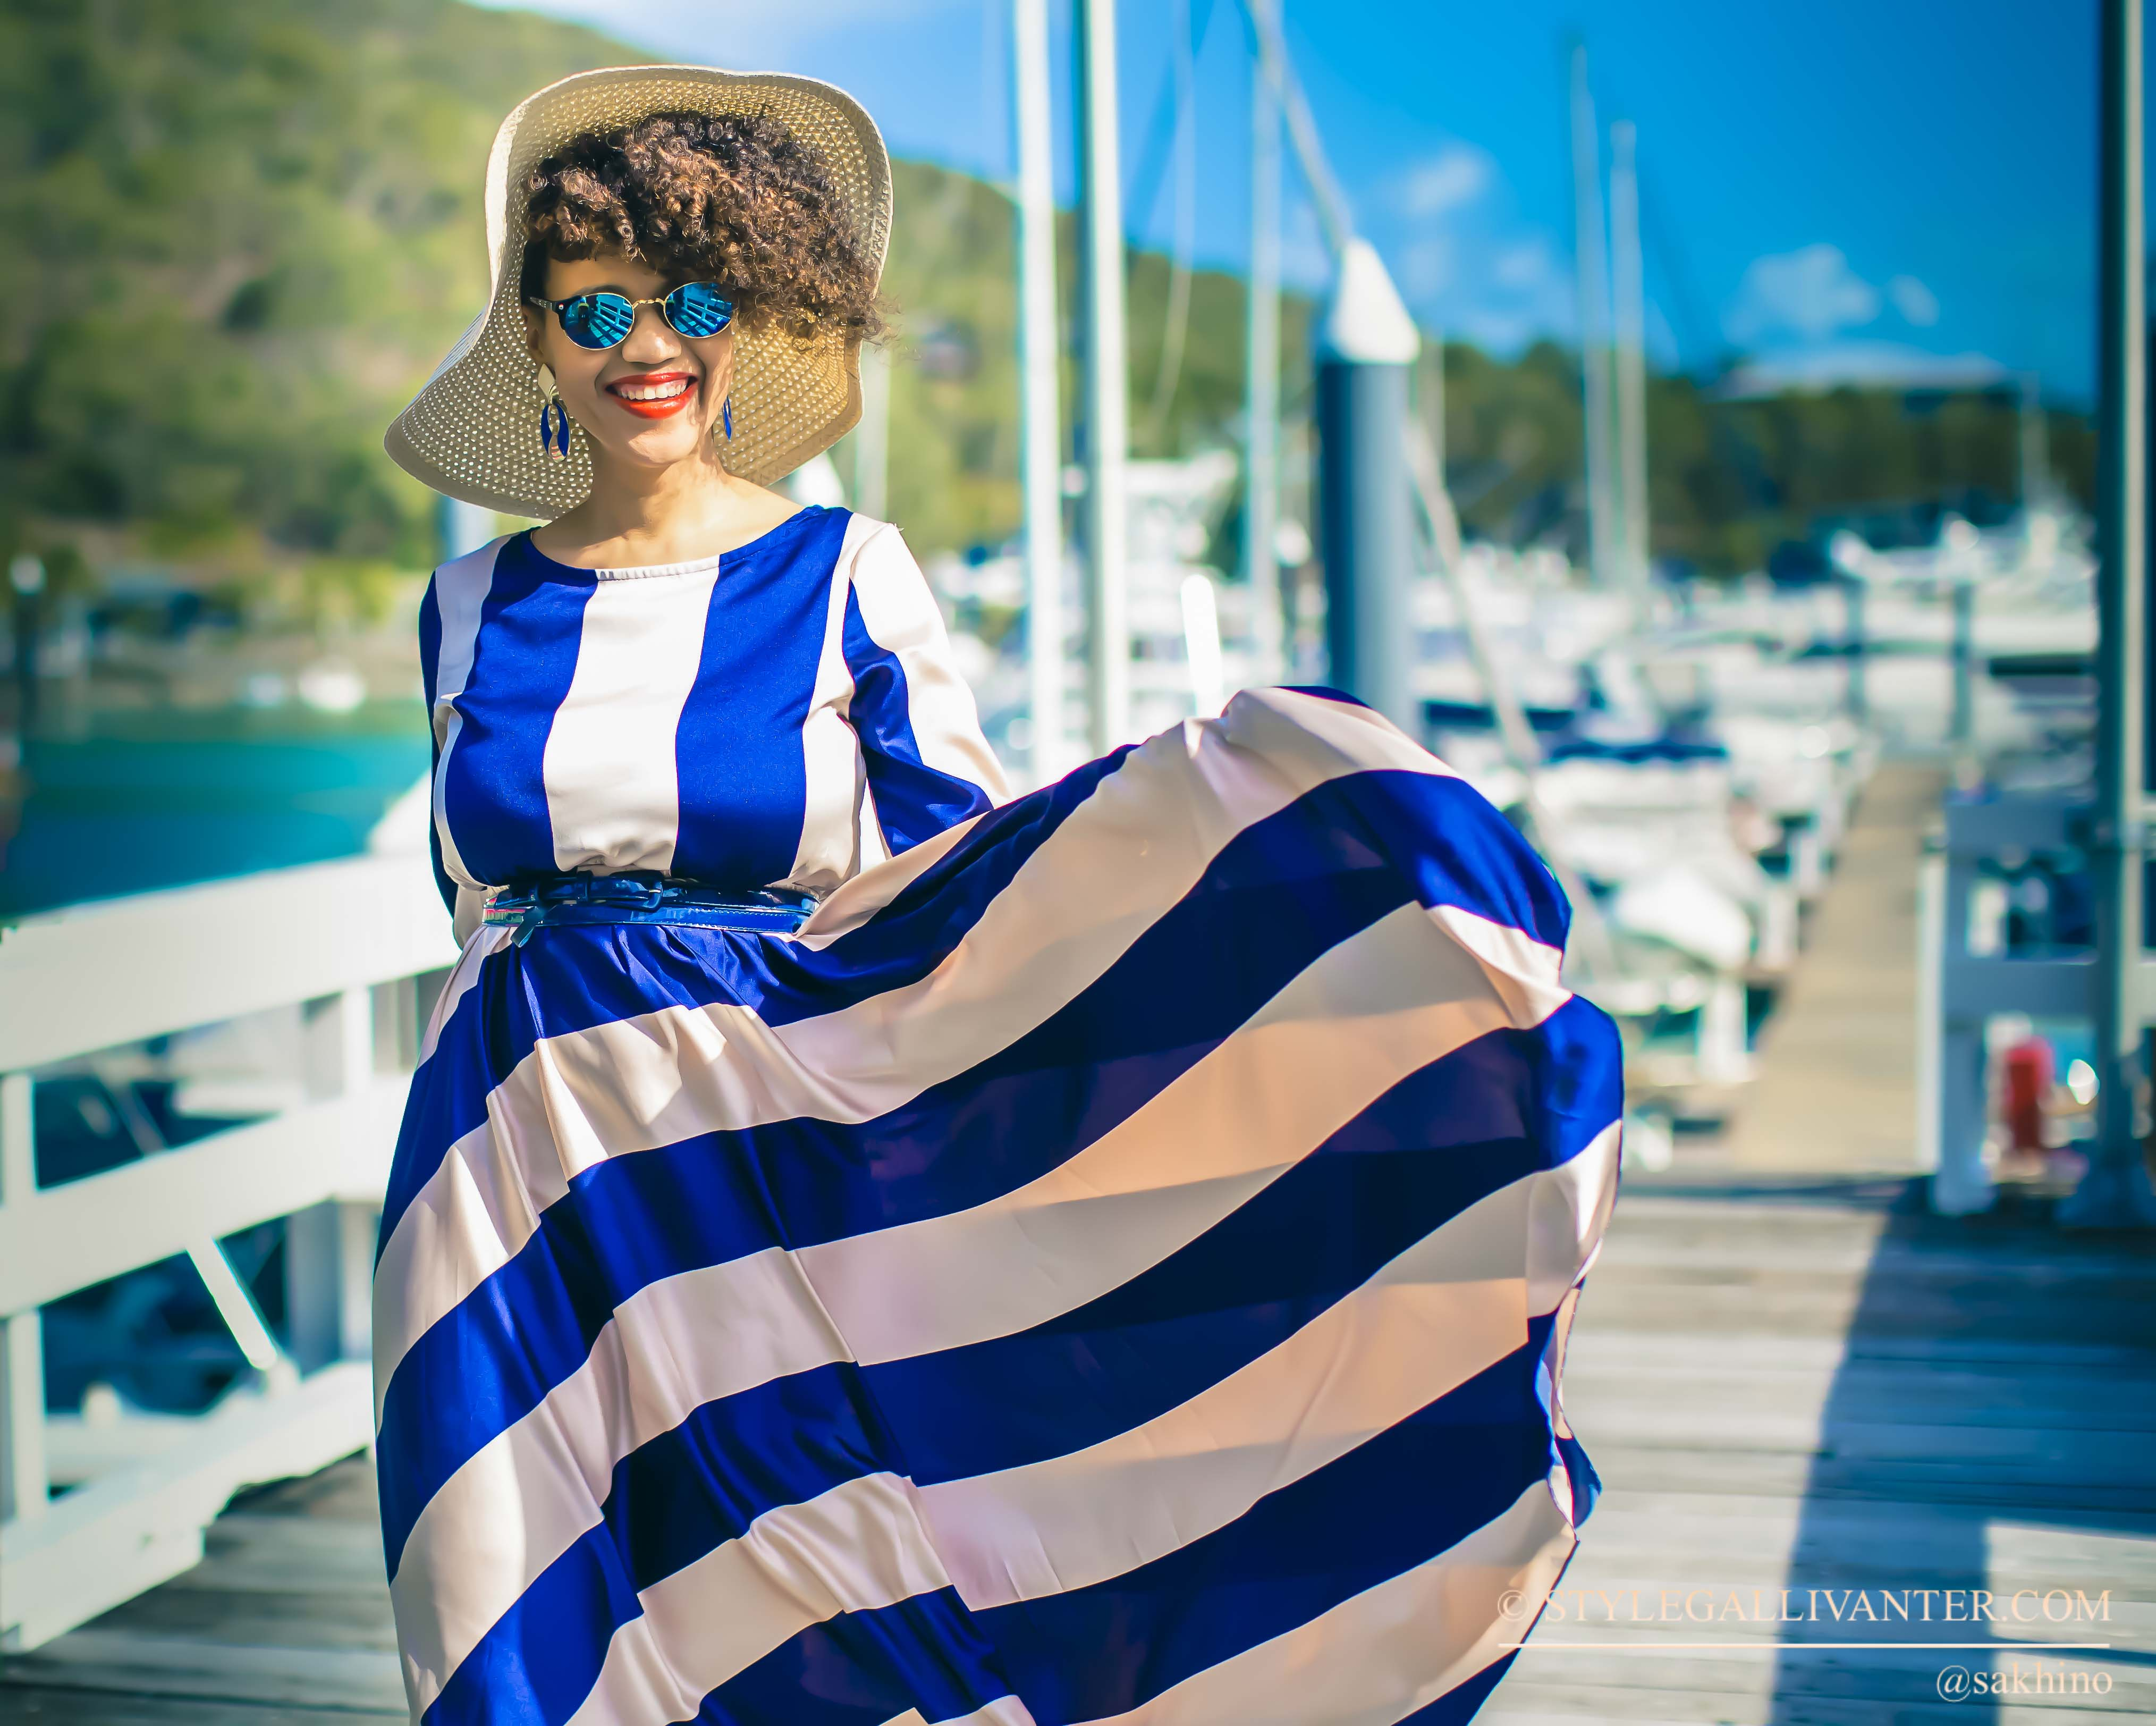 HAMILTON-ISLAND_TOP-AUSTRALIAN-DESTINATIONS_STYLEGALLIVANTER_MIRANDA-SAKHINO_sakhino_magazine-cover-december-2015_summer-2015-editorials_australia's-top-fashion-bloggers-4